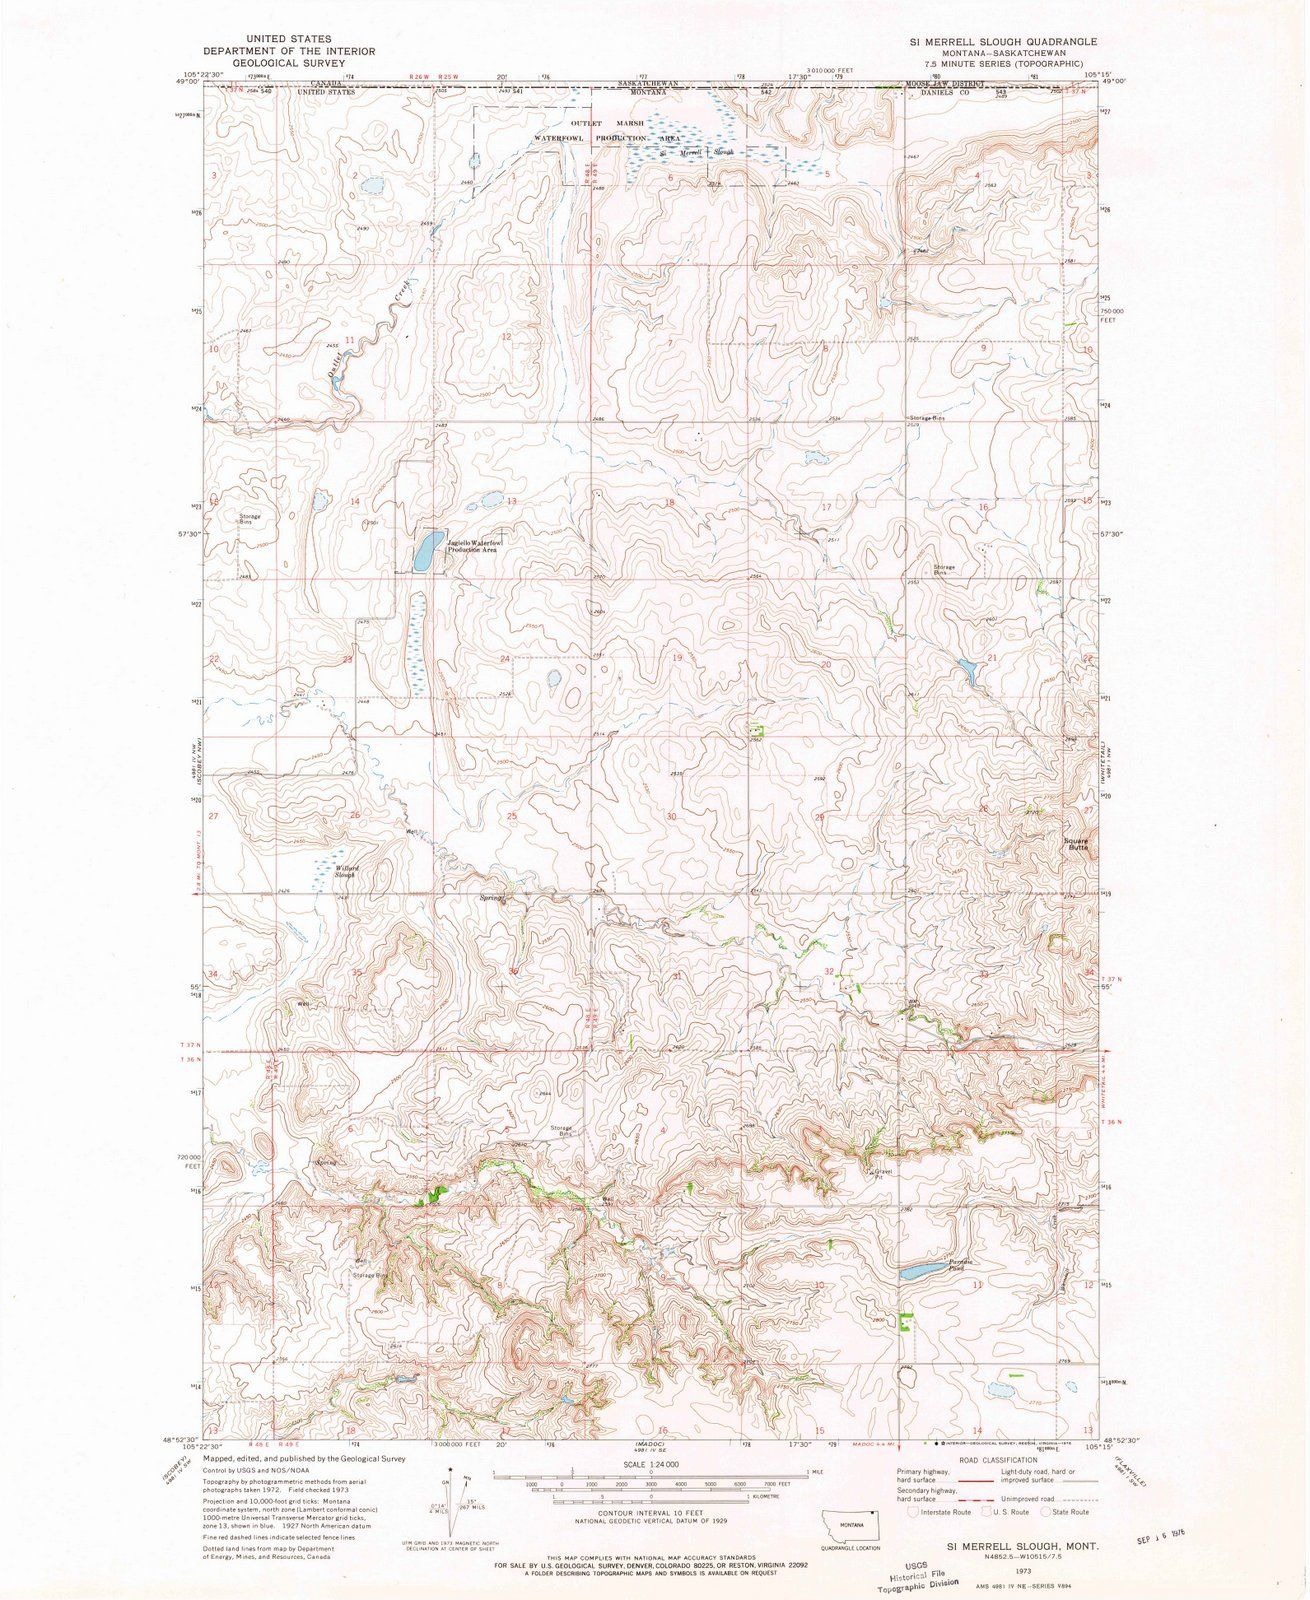 <p>1973 Si Merrell Slough, MT - Montana - USGS Topographic Map</p>